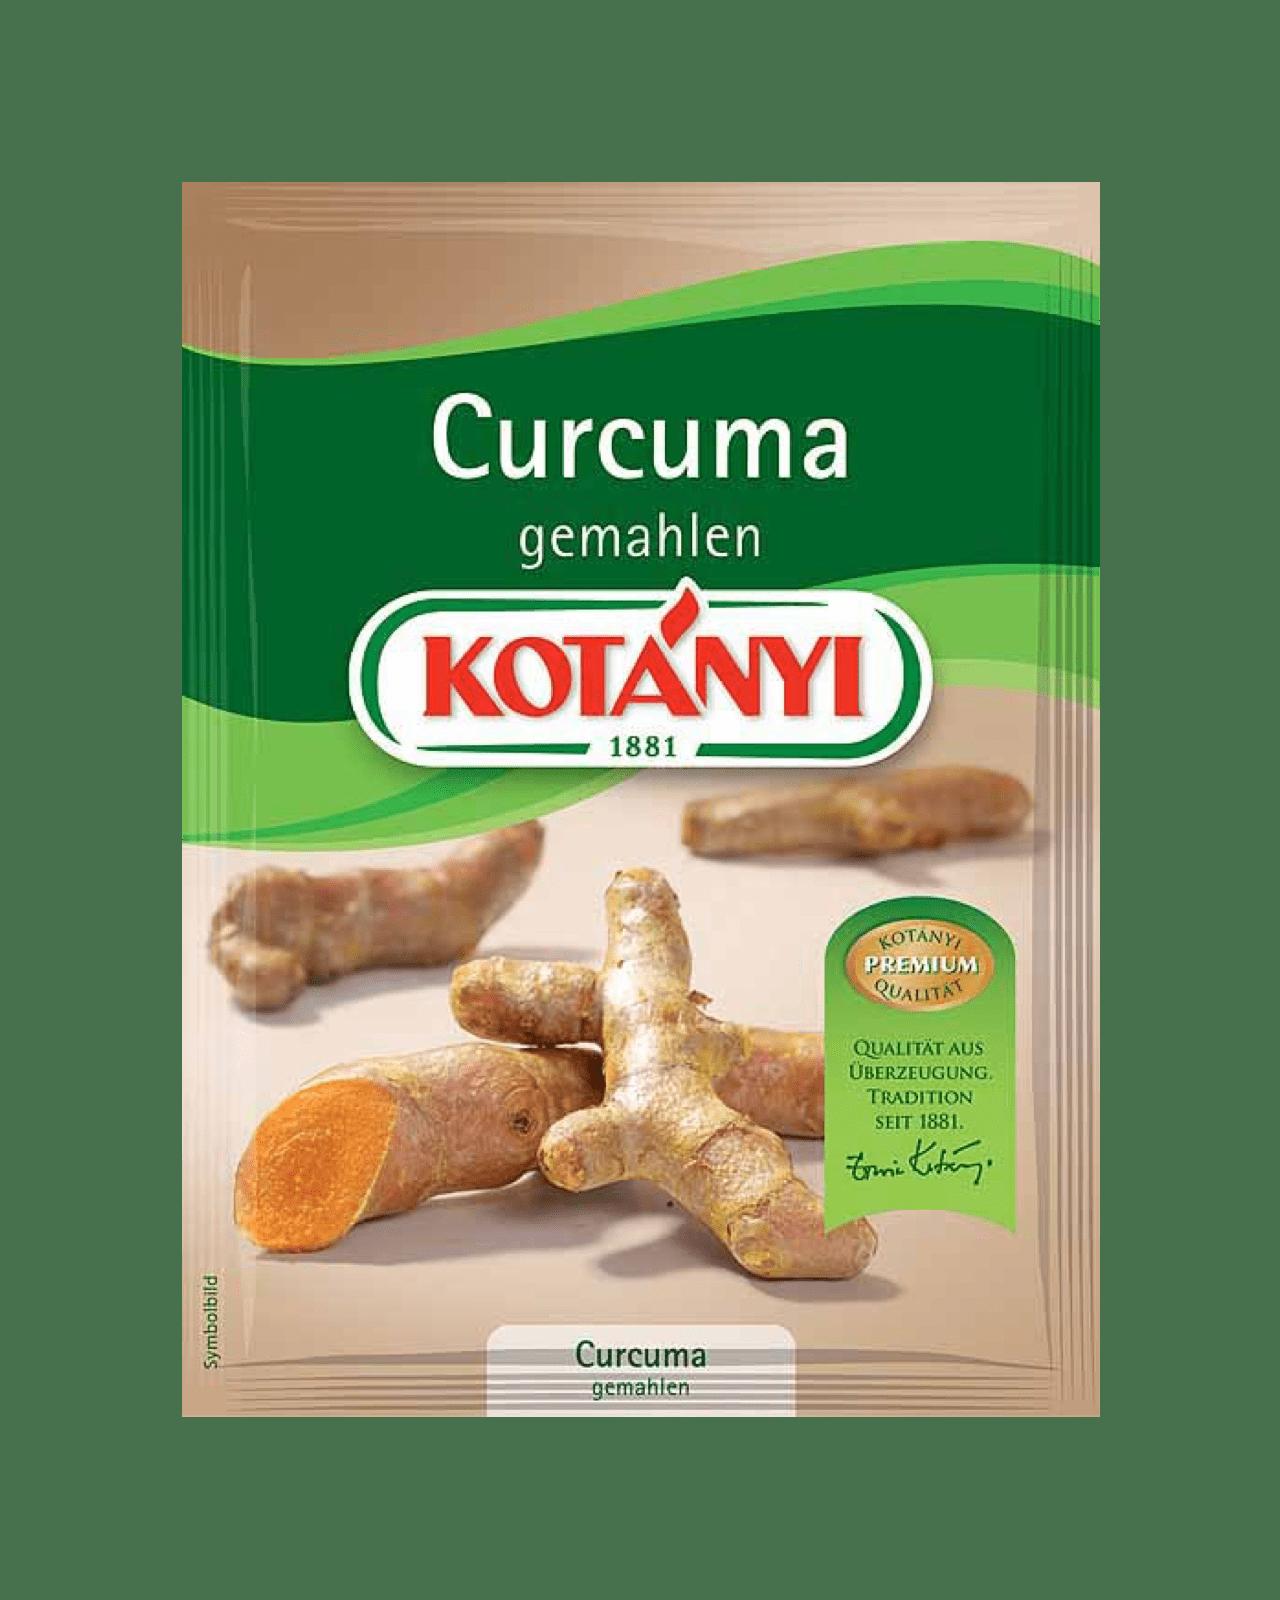 Kotányi Curcuma gemahlen im Brief